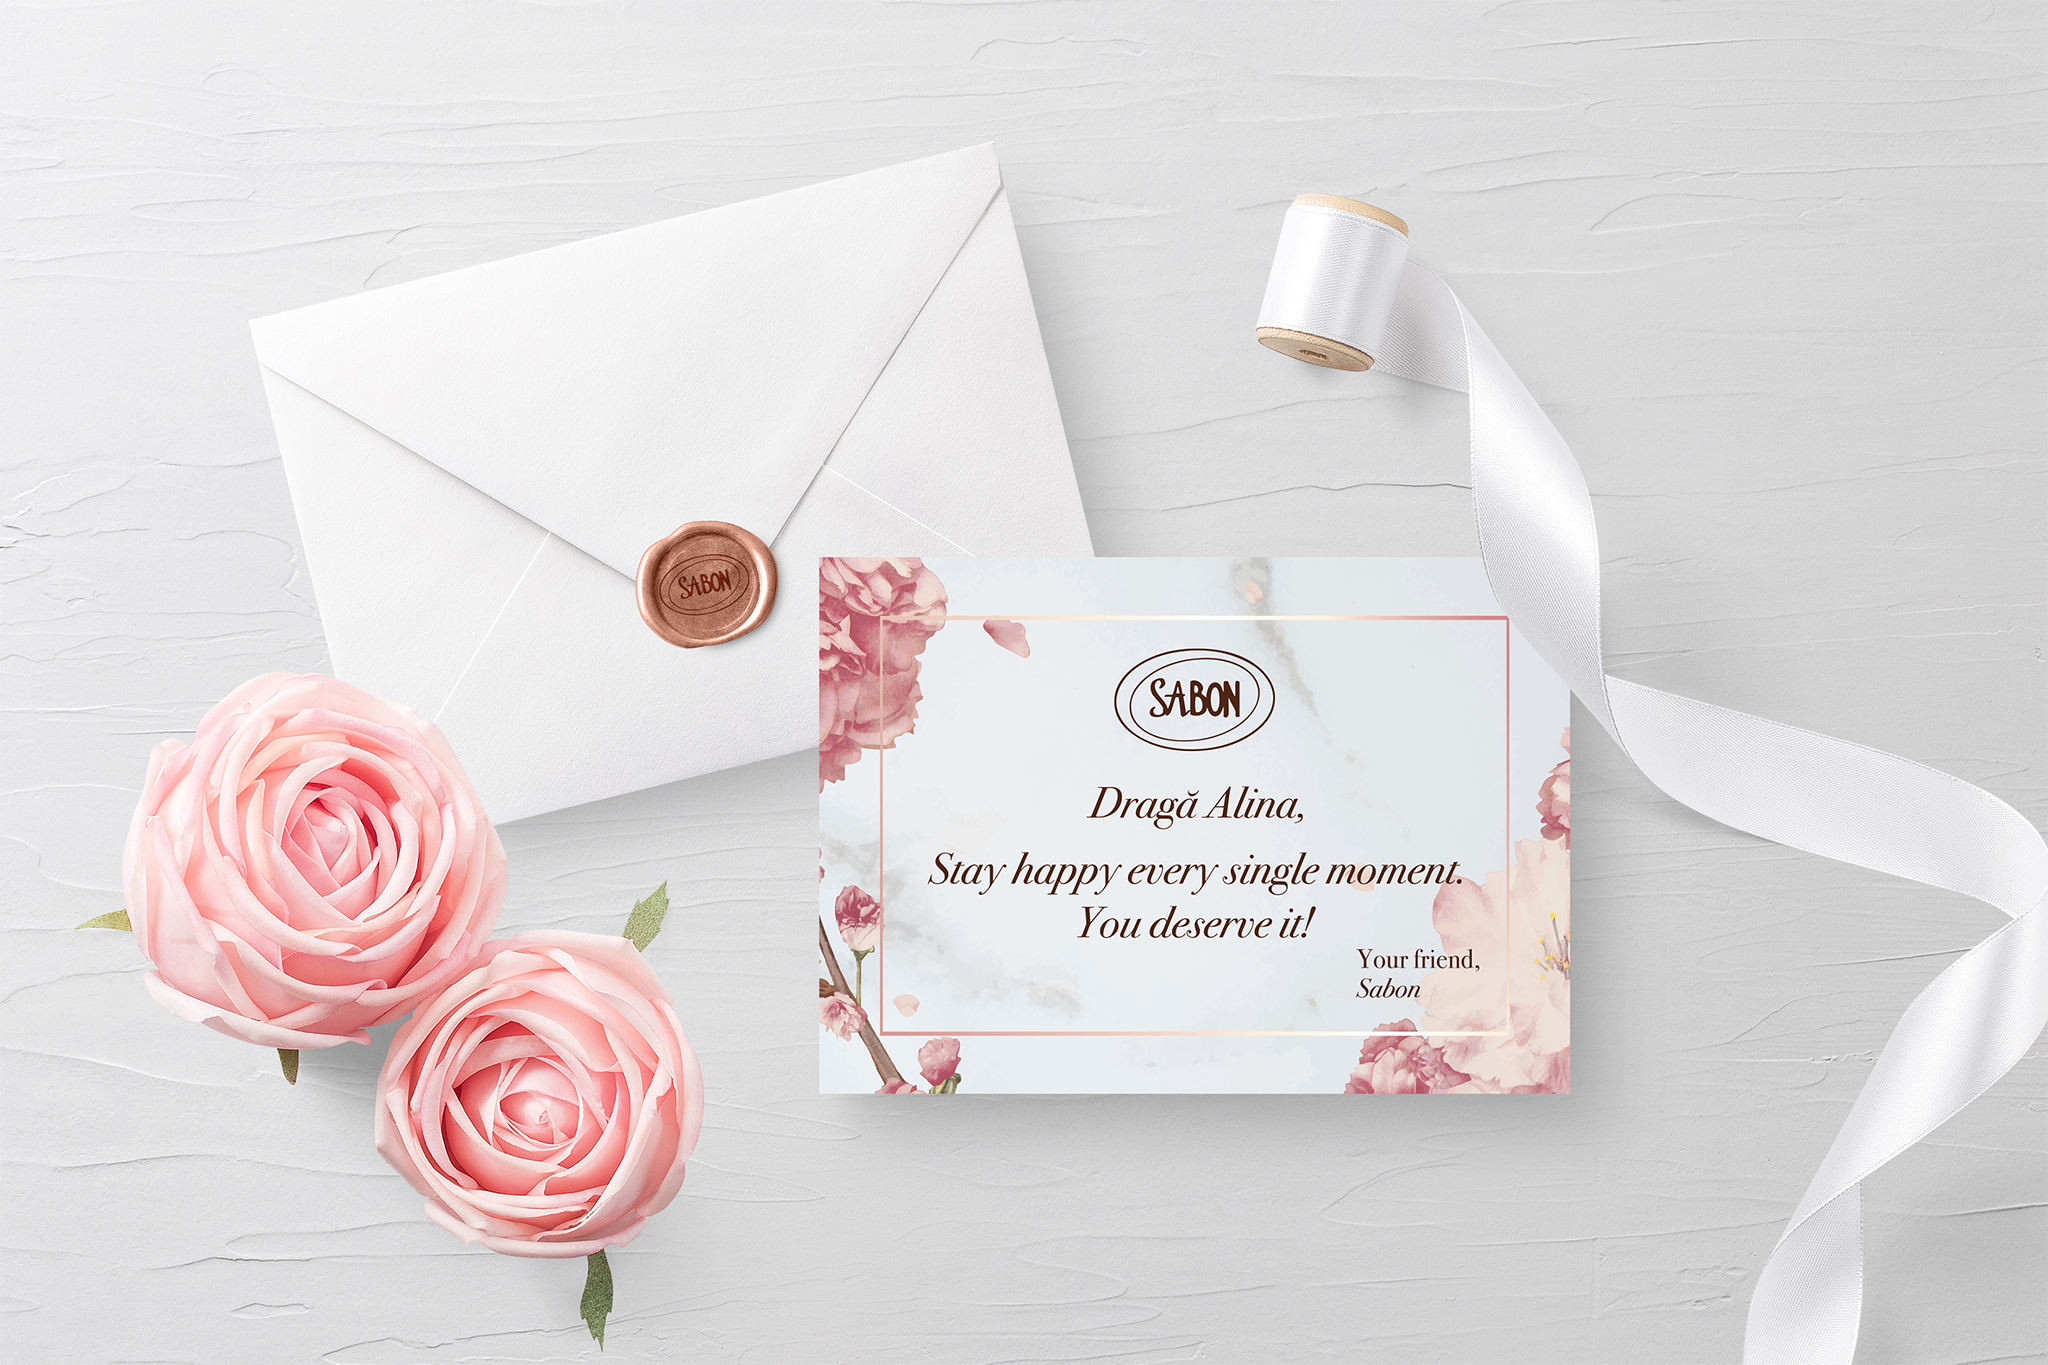 Sabon Print Invitation